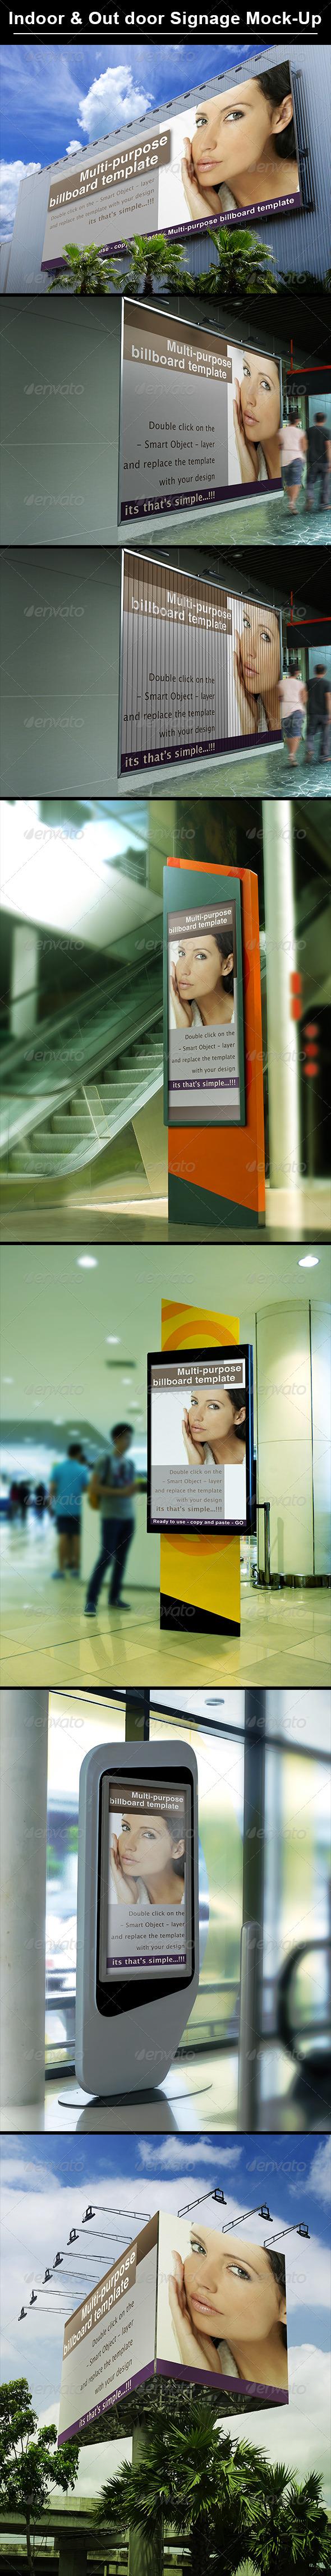 Billboard & Indoor Signage Display Mock Up - Graphics